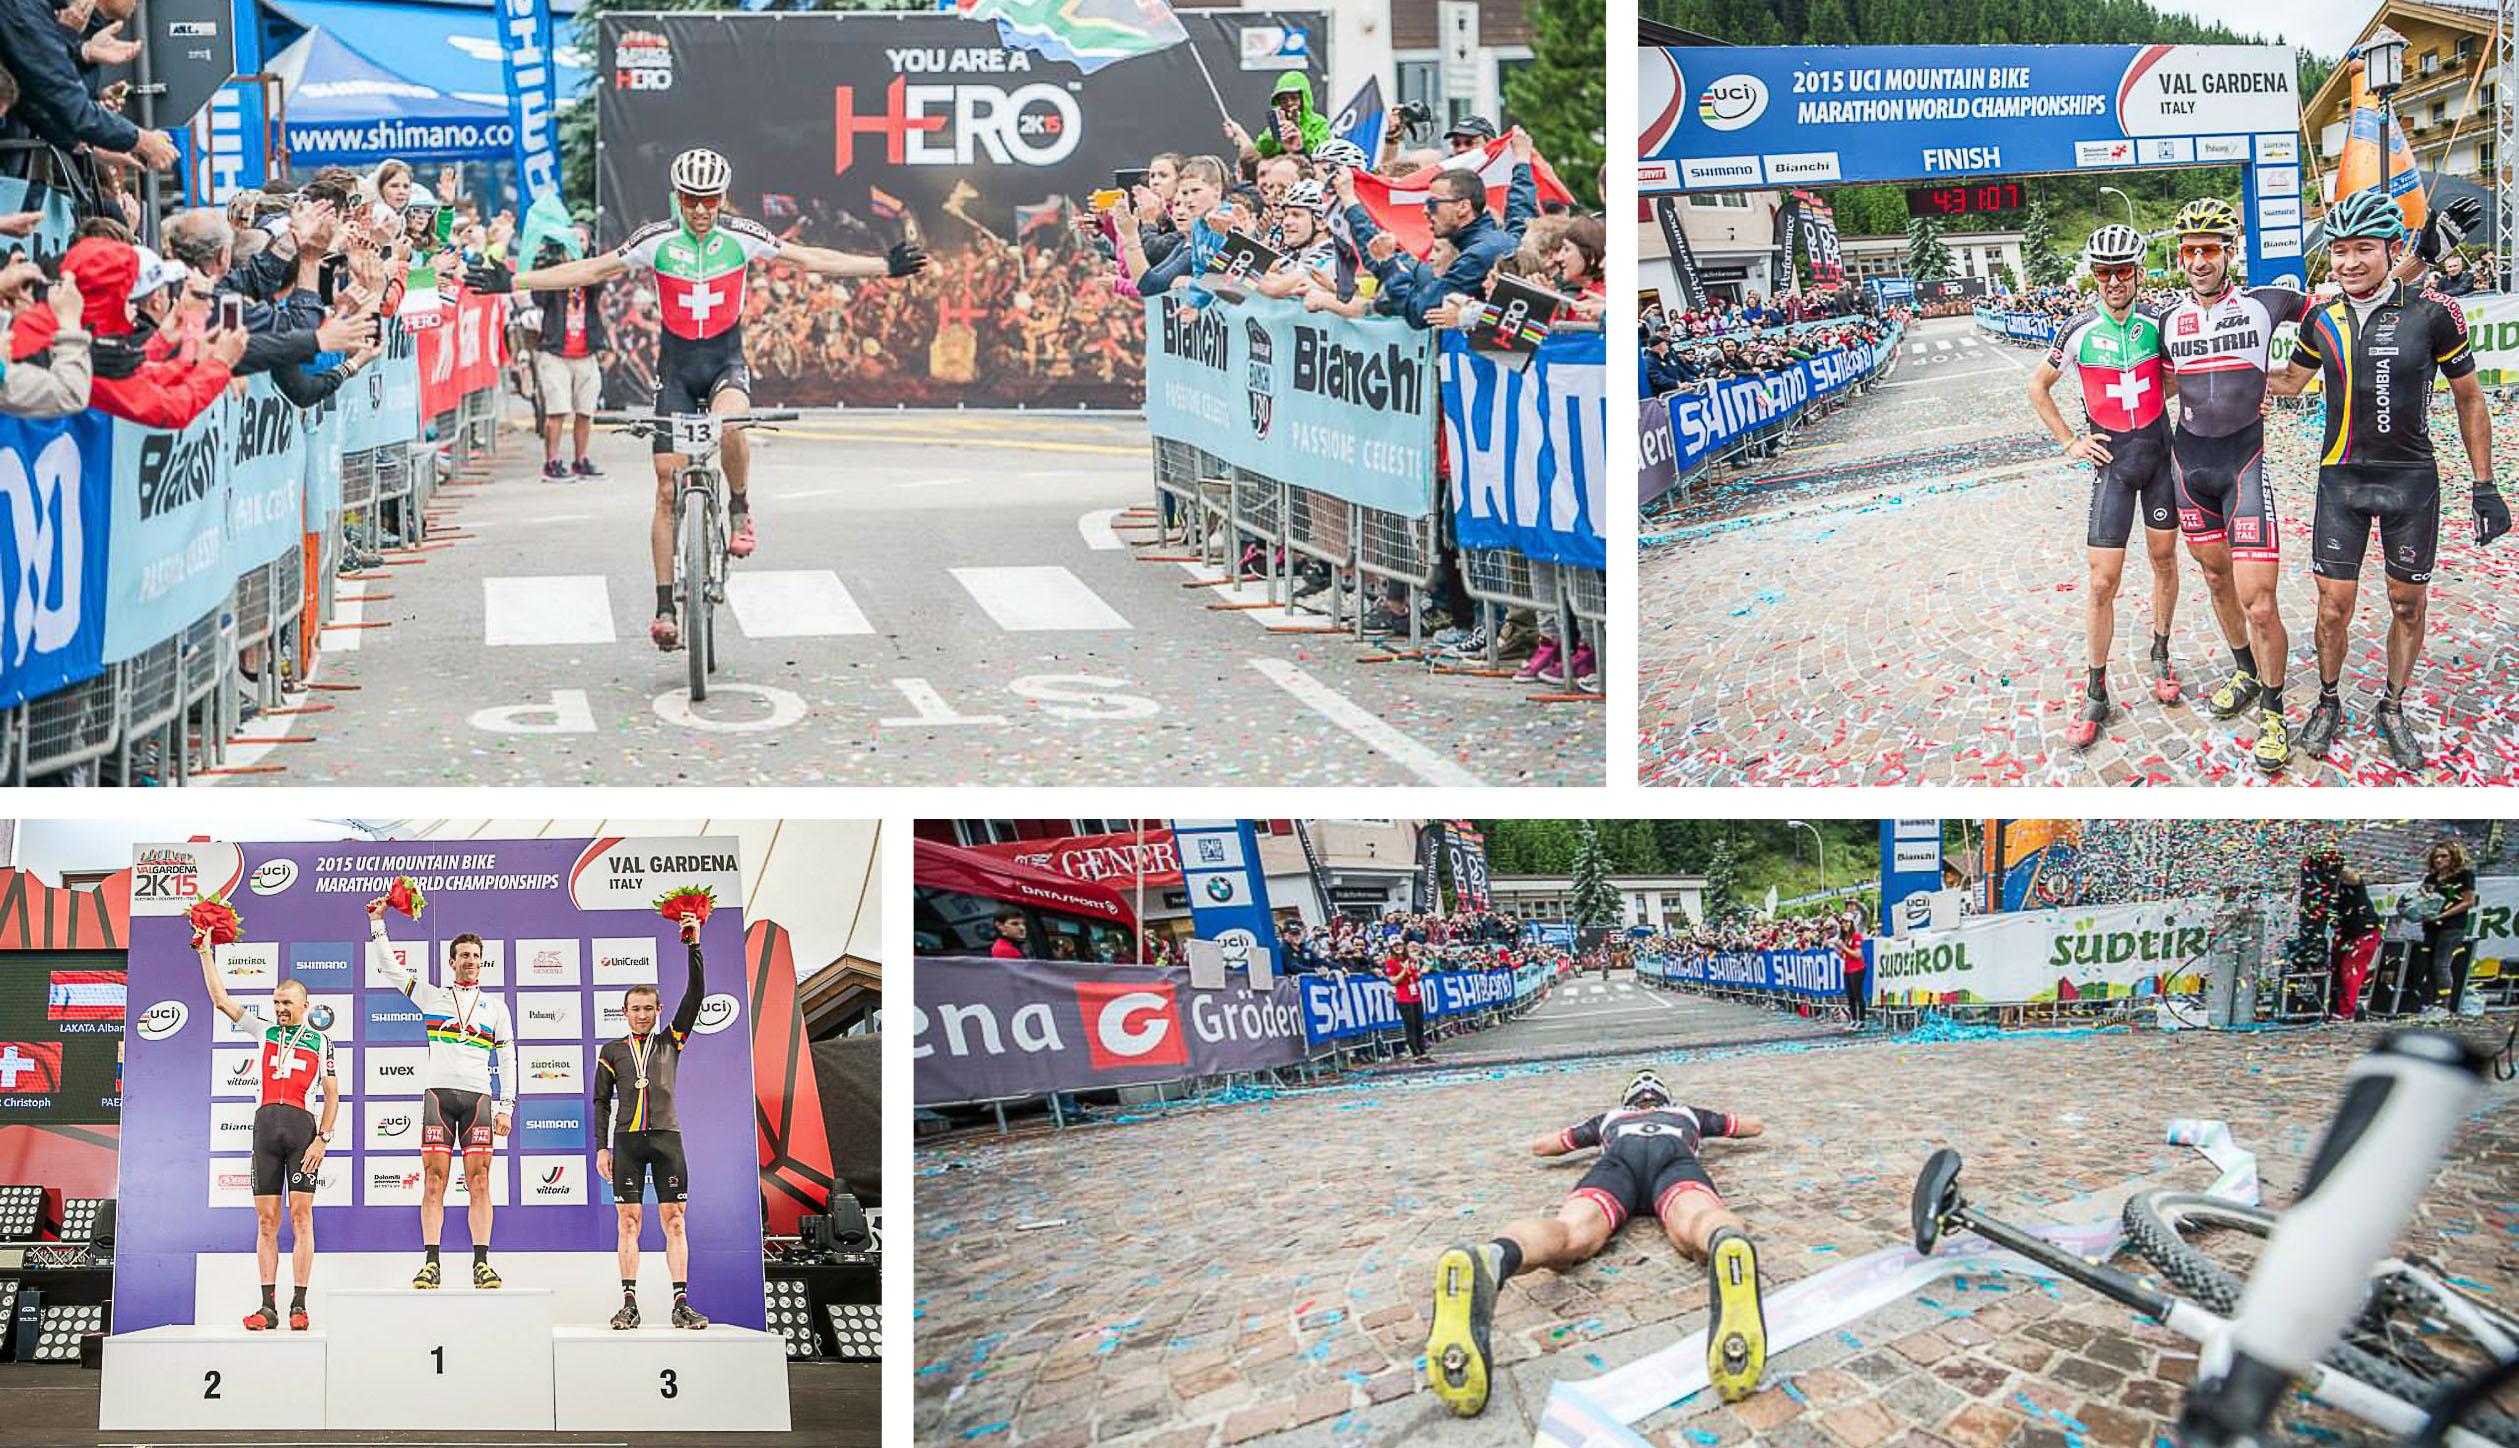 6-Championnat_Monde_Marathon_2015_Val_Gardena_Copyright_Sella_Ronda_Hero-1-2